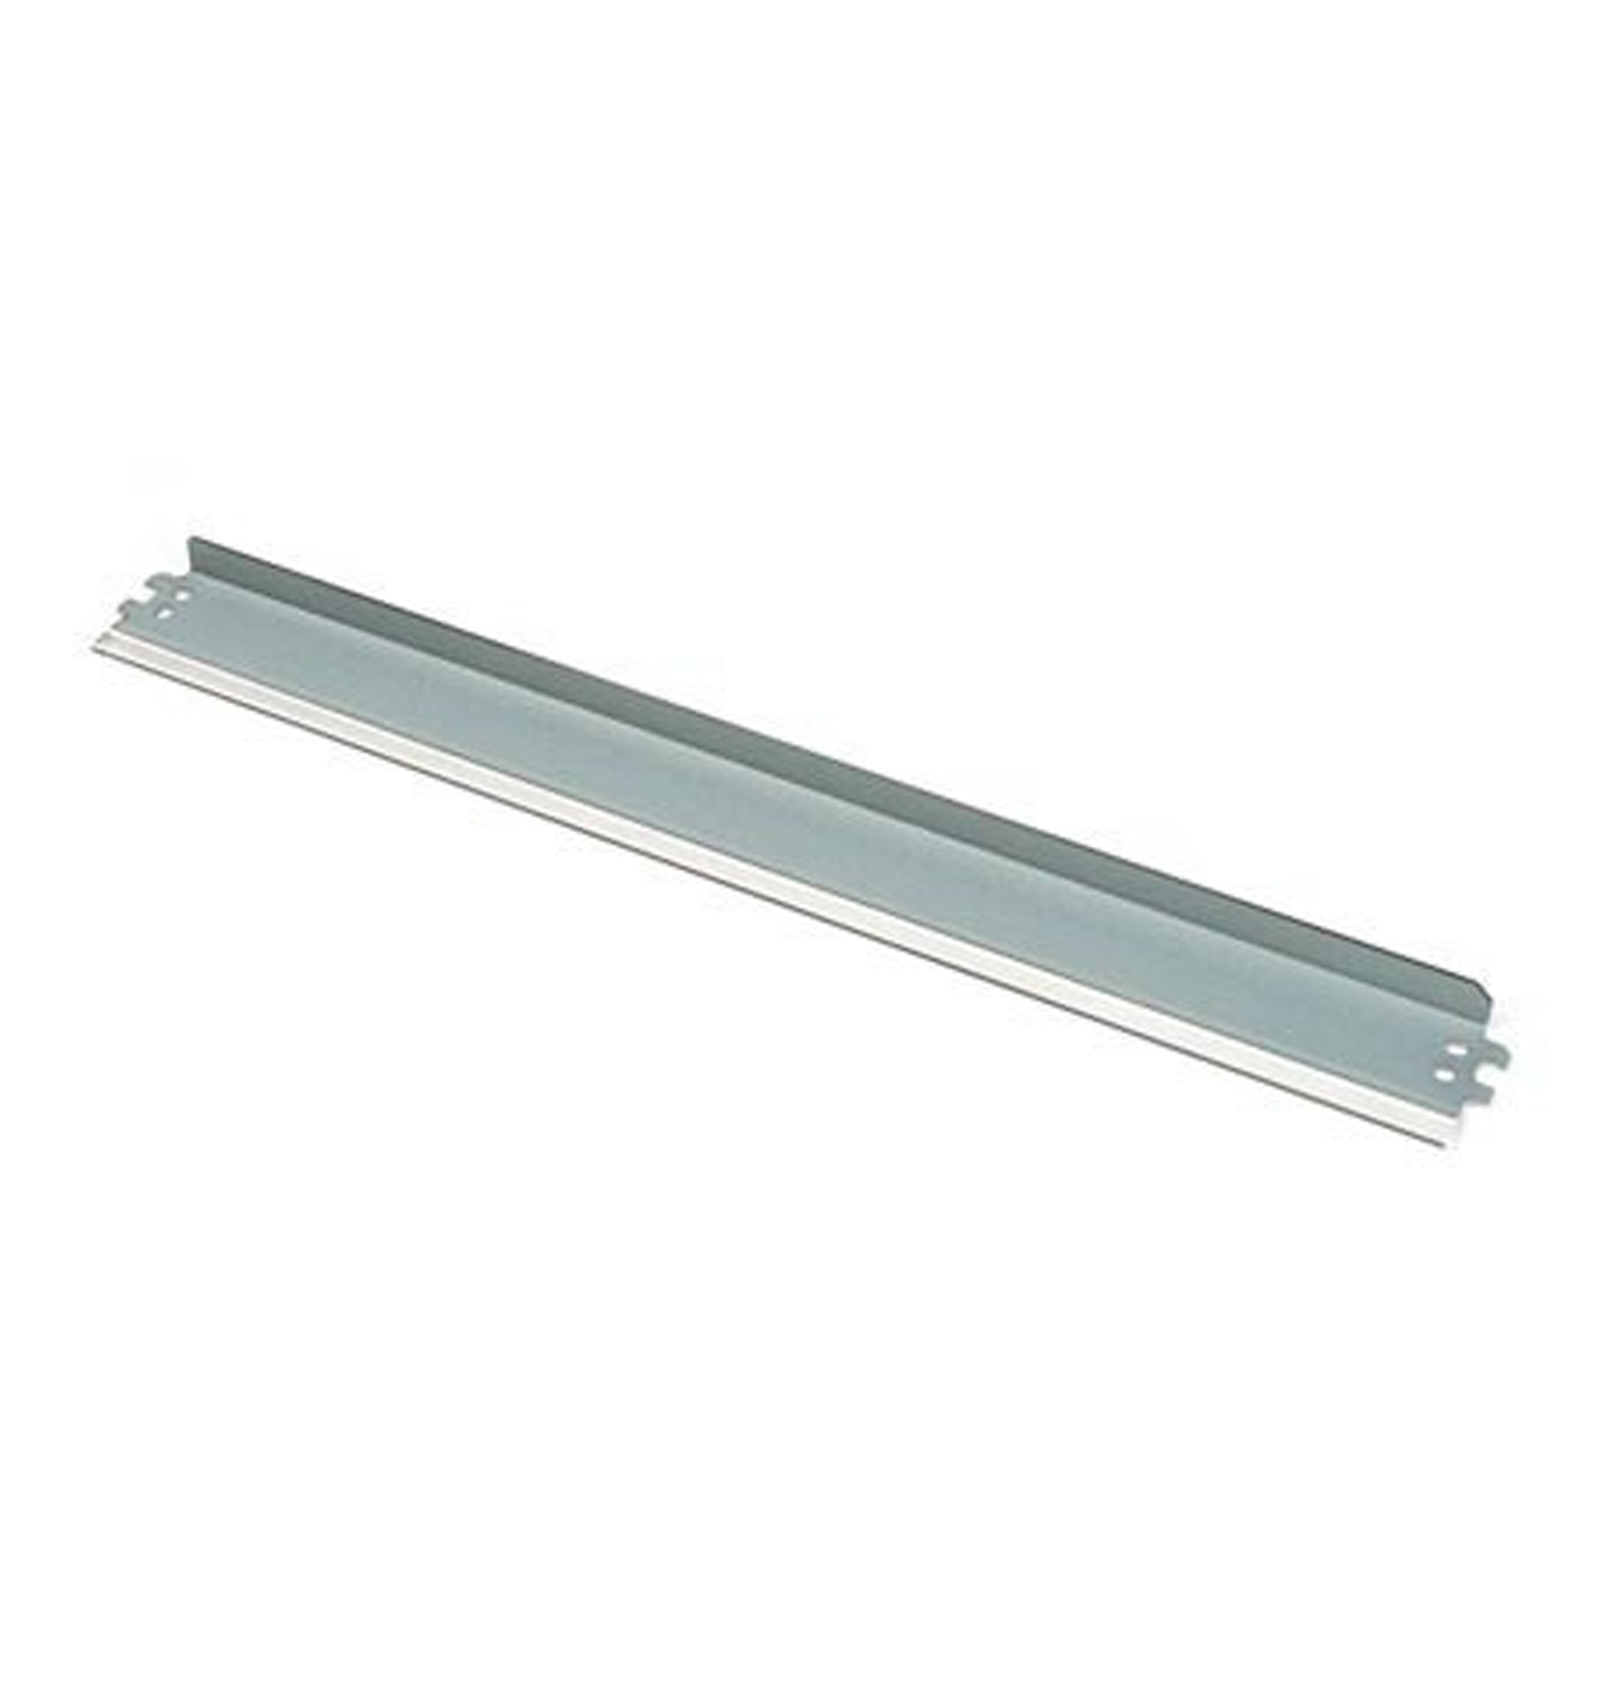 Замена ракеля картриджа HP CF280A/X (80A/X) для LaserJet Pro 400 M401/M425